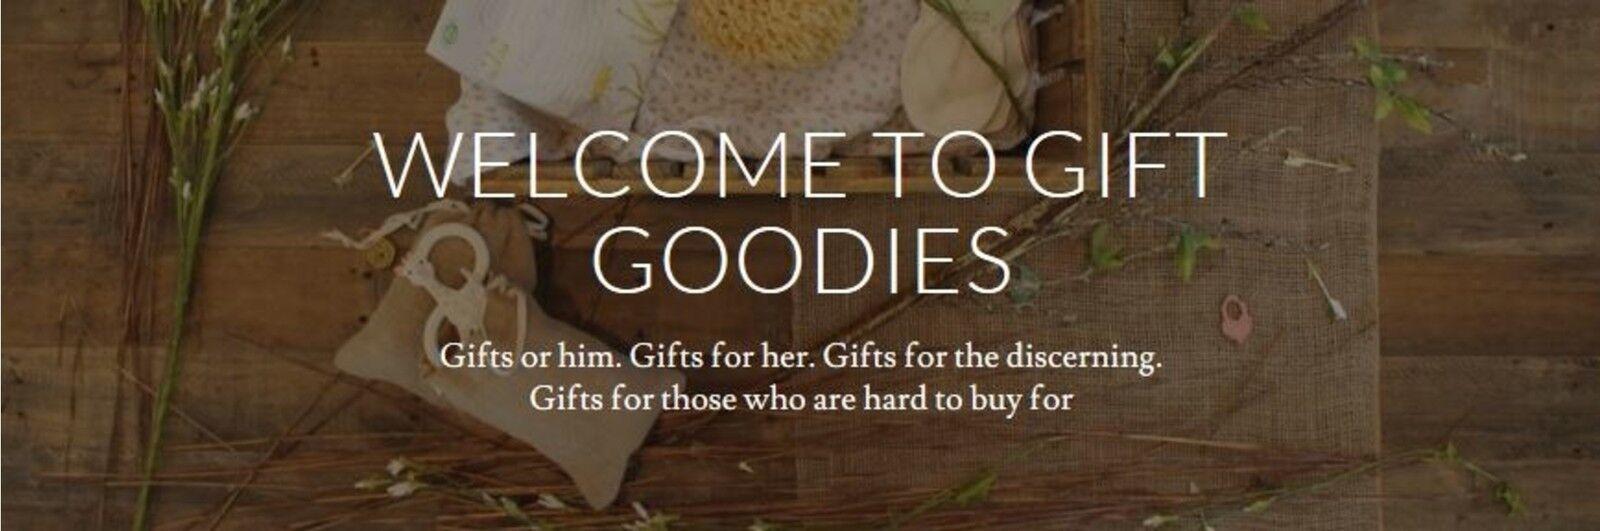 Gift Goodies